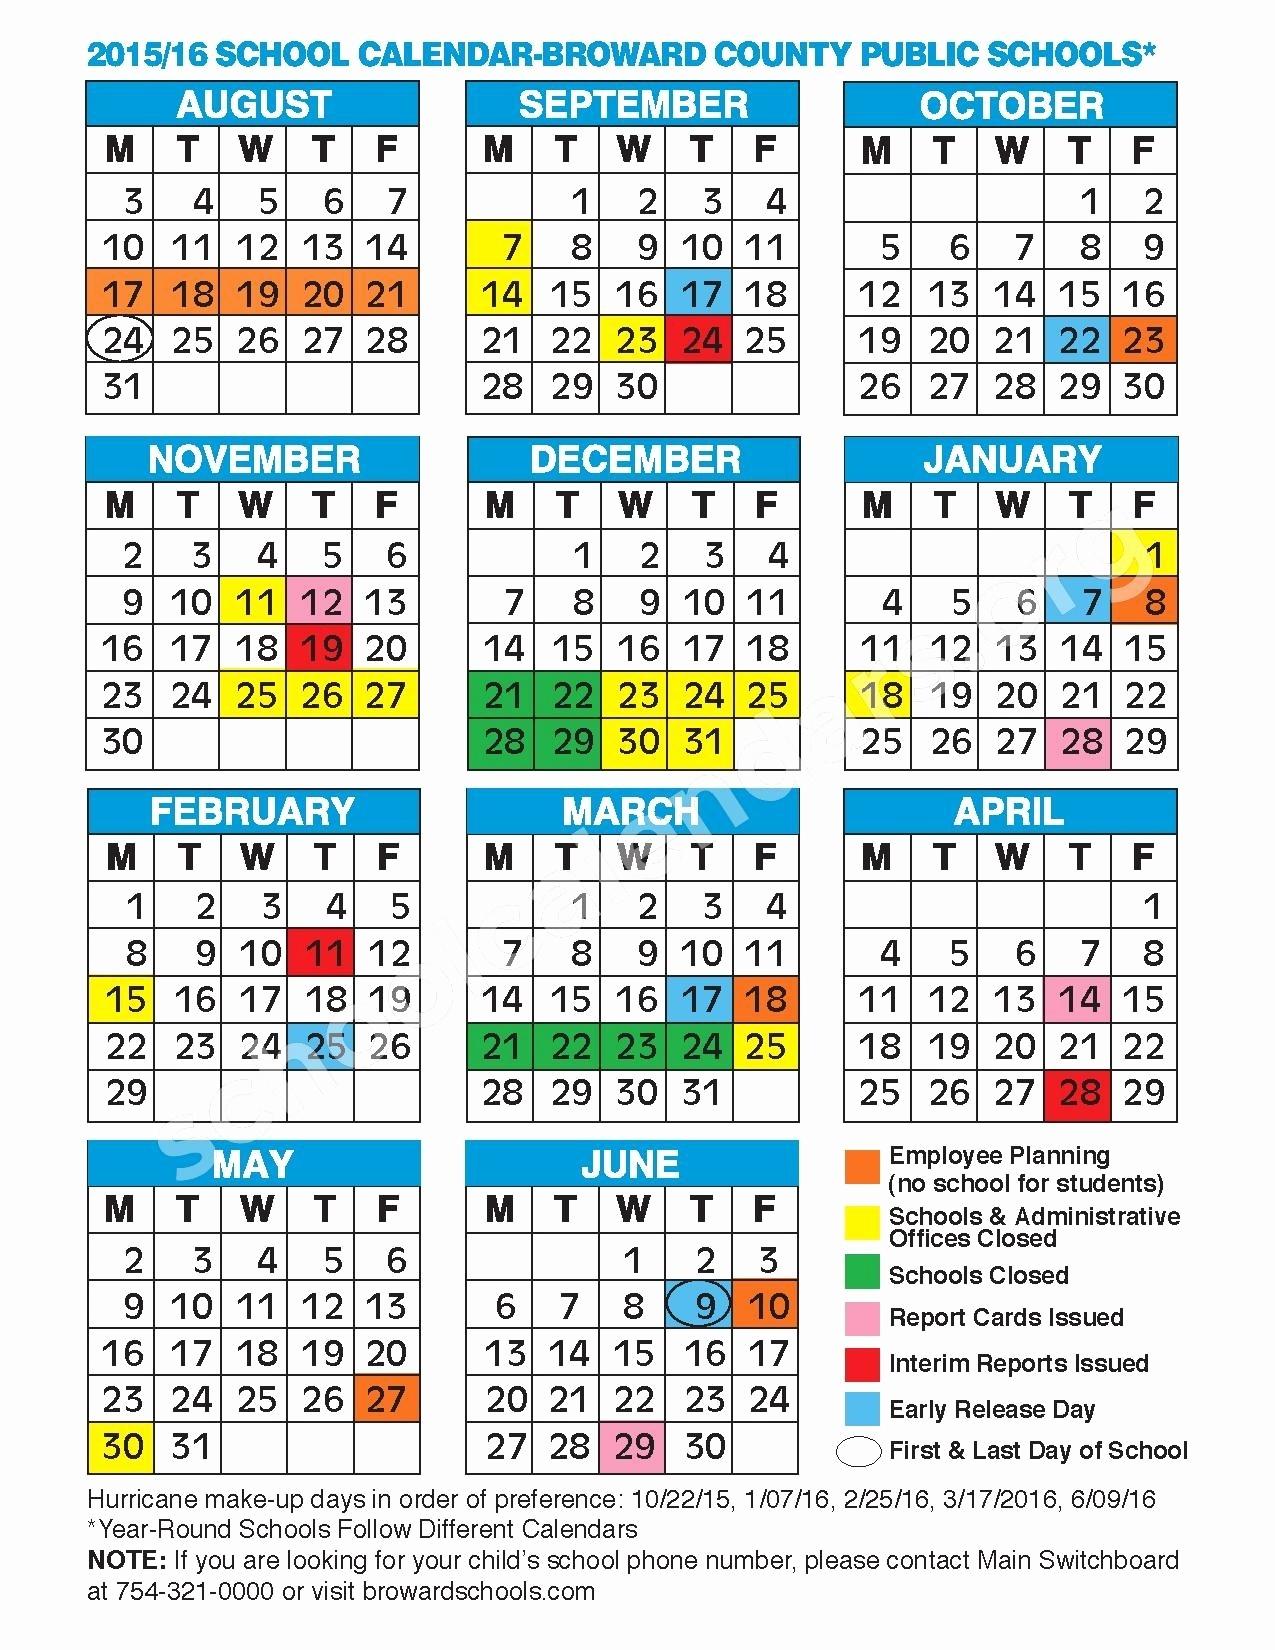 2019 2020 School Calendar Broward Melbourne Senior High School_School Calendar For Broward County